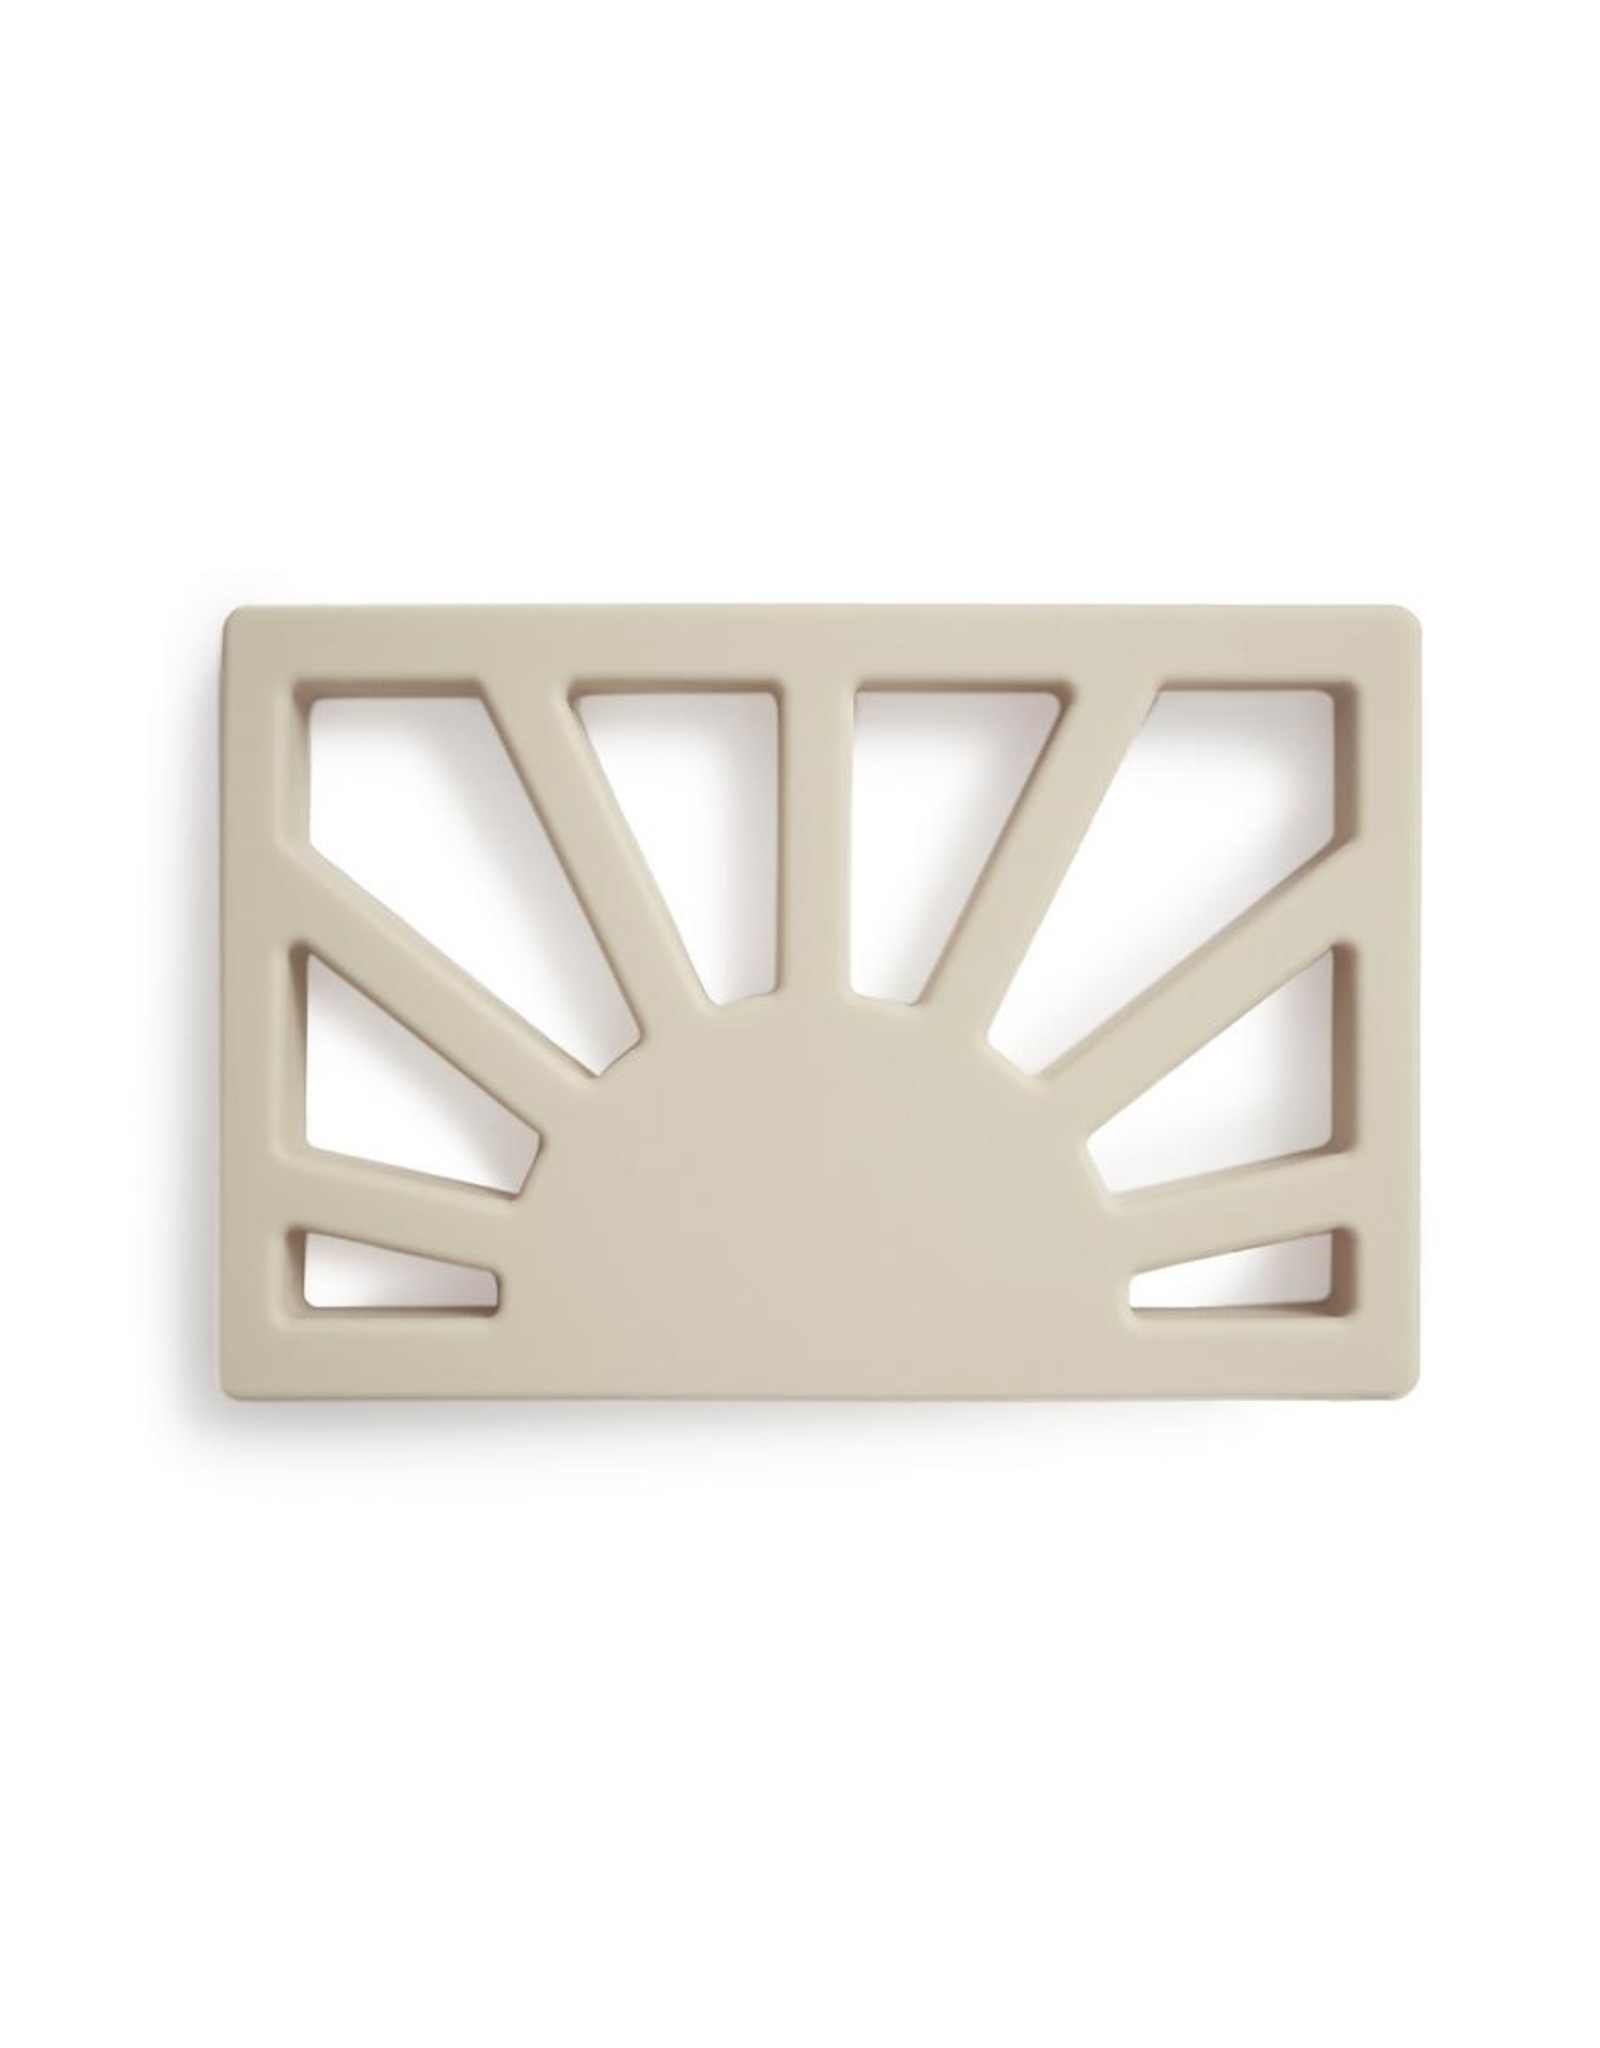 Mushie Silicone Sun teether - Shifting sand